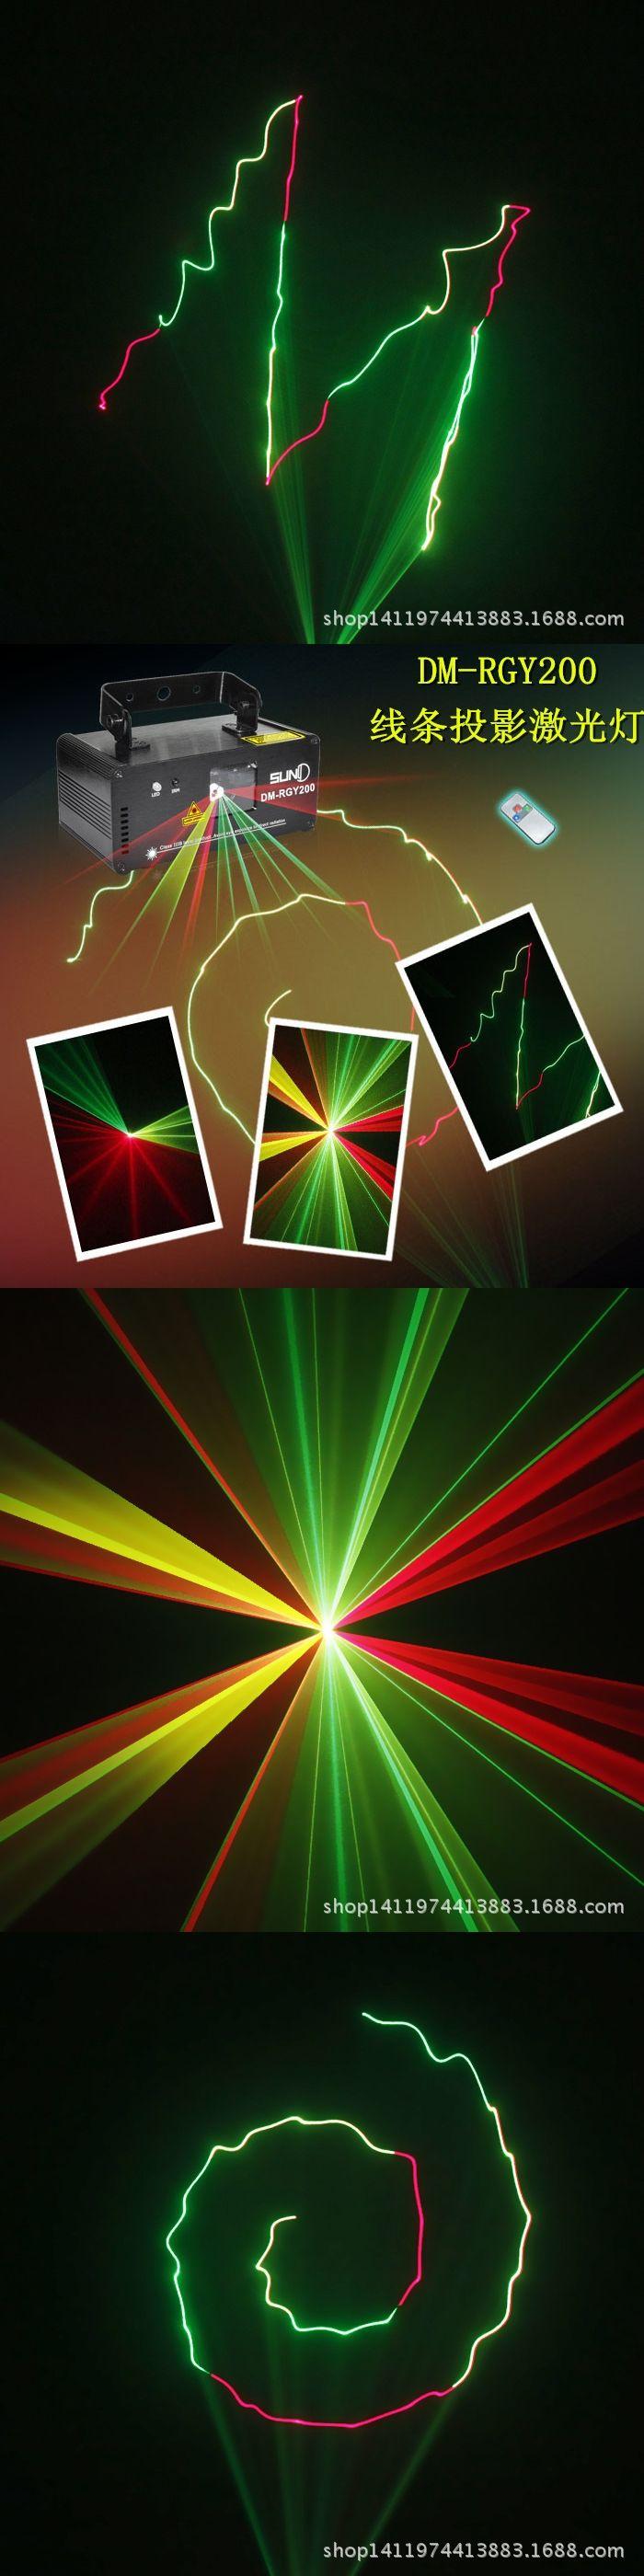 High quality line laser acoustic ceiling laser stage lights The light beam of light bar